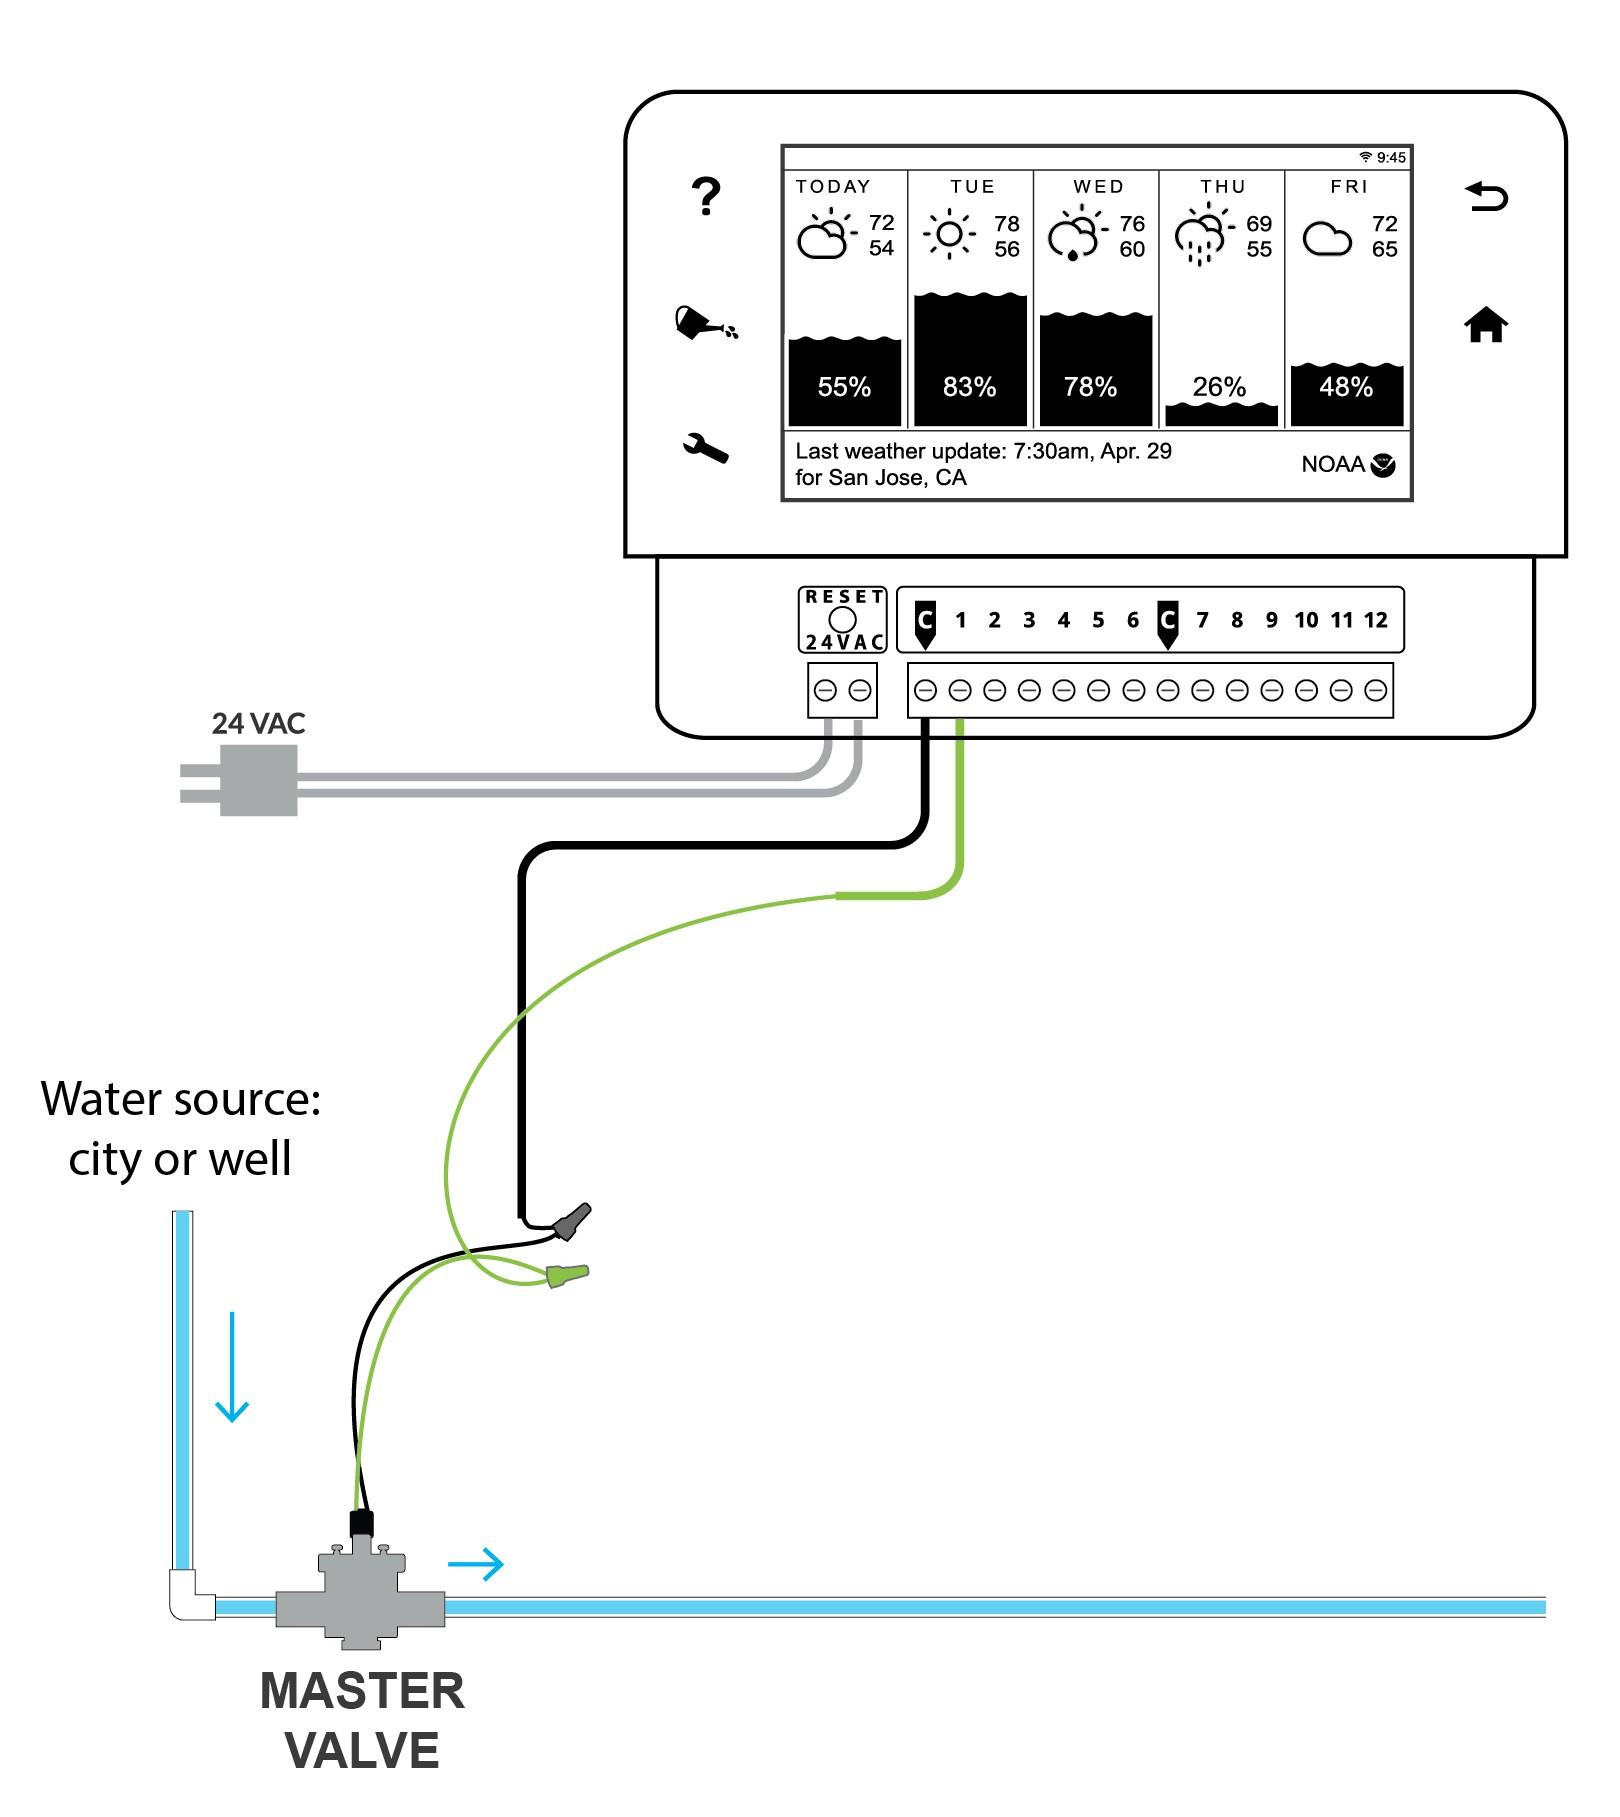 Pump Start Relay Wiring Diagram Watermaster Pump Start Relay Wiring Diagram